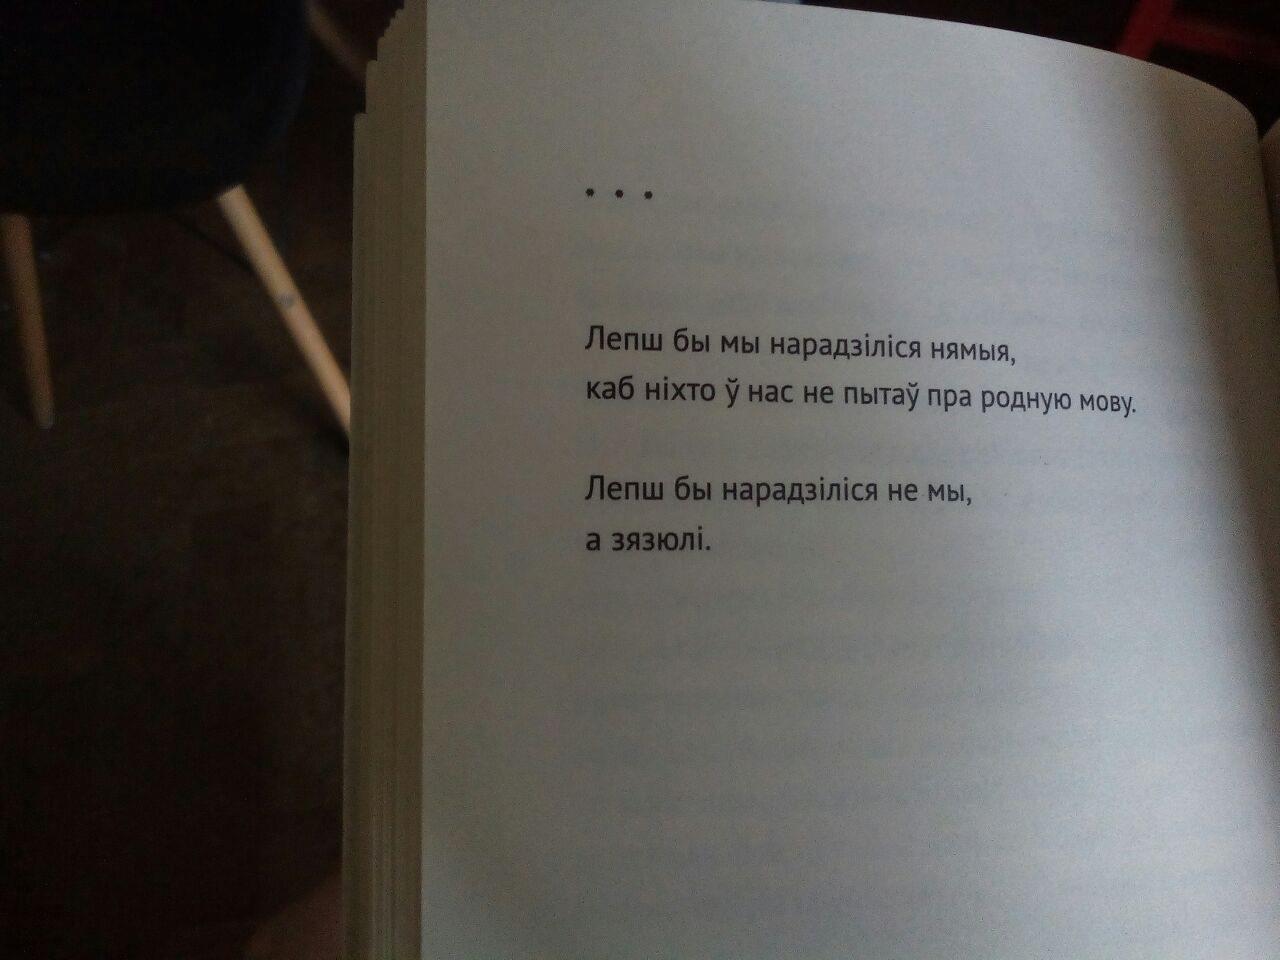 Вірш білоруської поетки Вальжини Морт - 032.ua